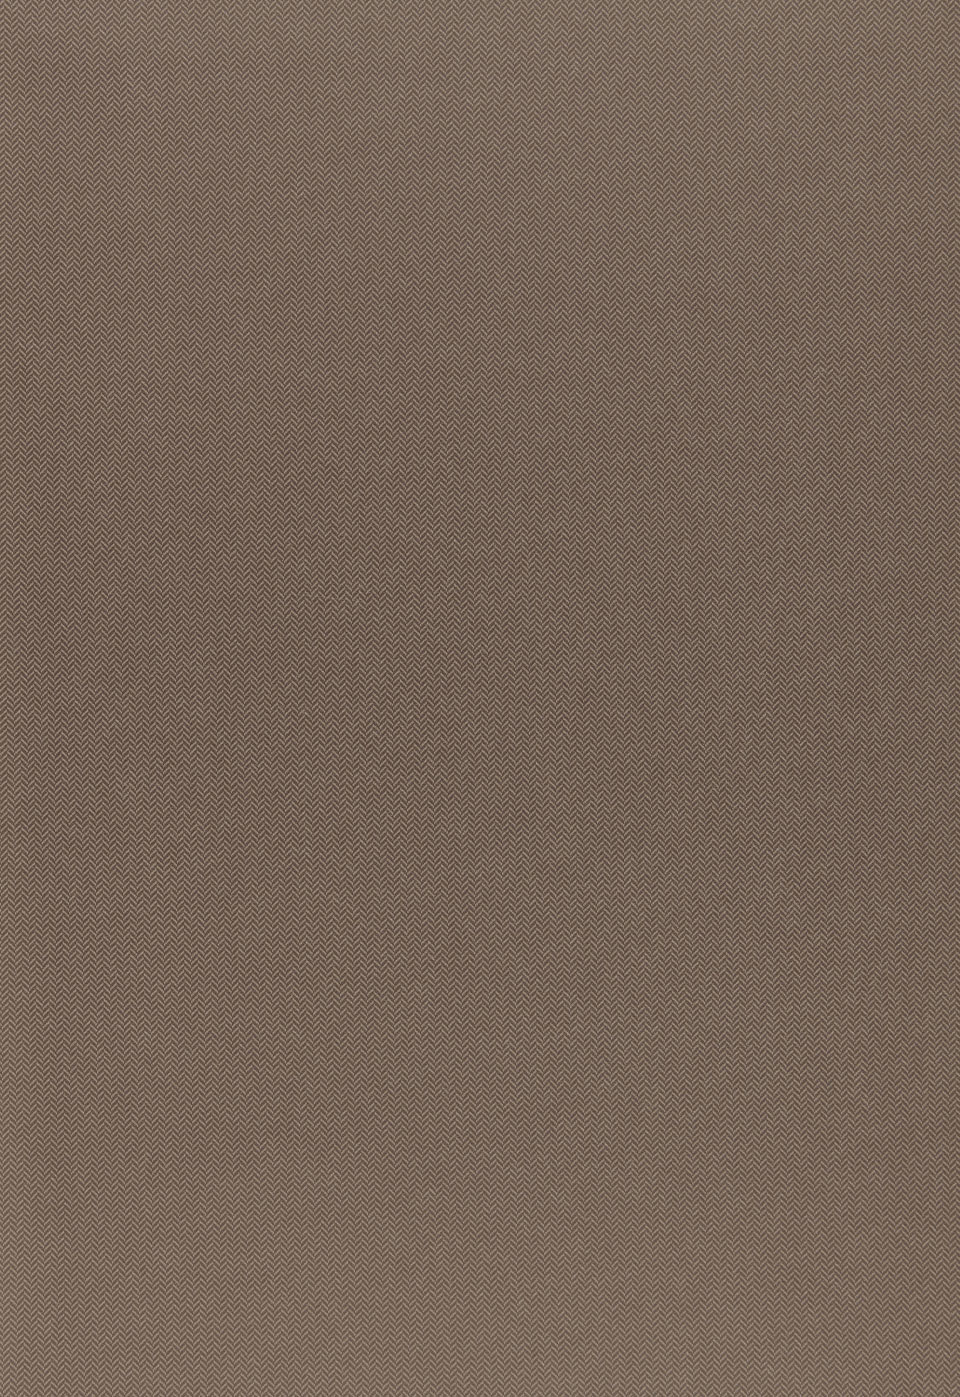 Американские обои Schumacher,  коллекция Luxe Lodge, артикул5006272